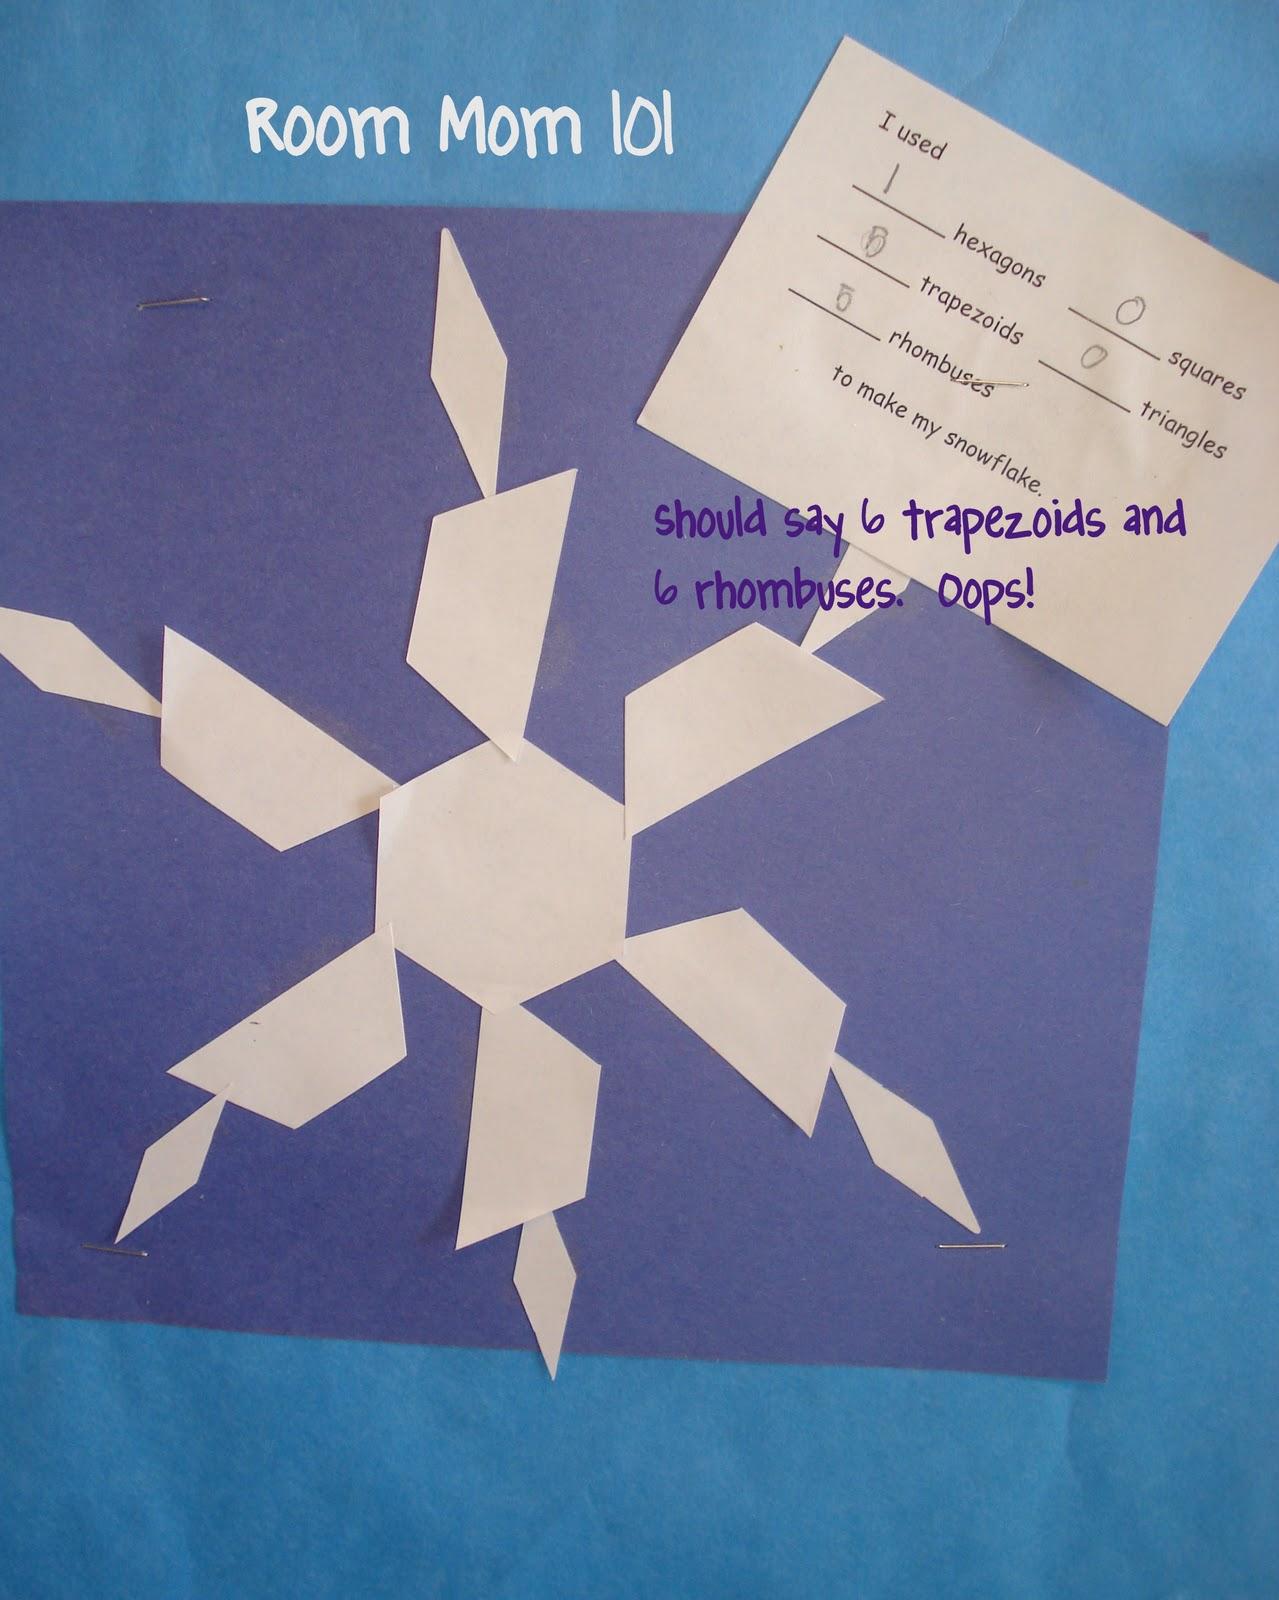 Room Mom 101 Fun With Geometry